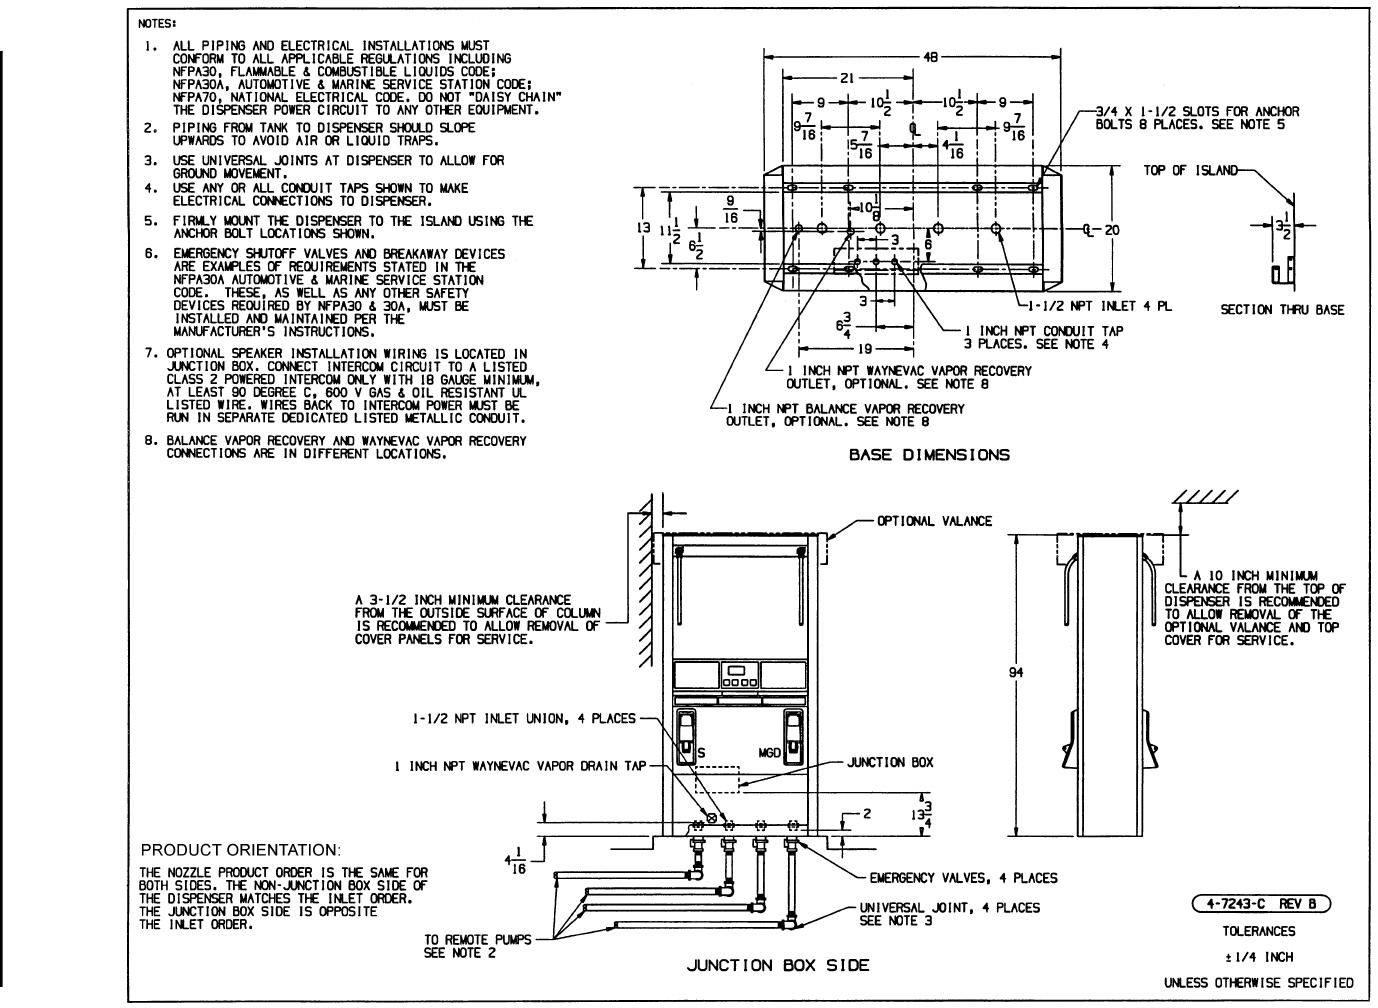 Wayne Fueling Systems VISTA RF ID Tag Reader User Manual